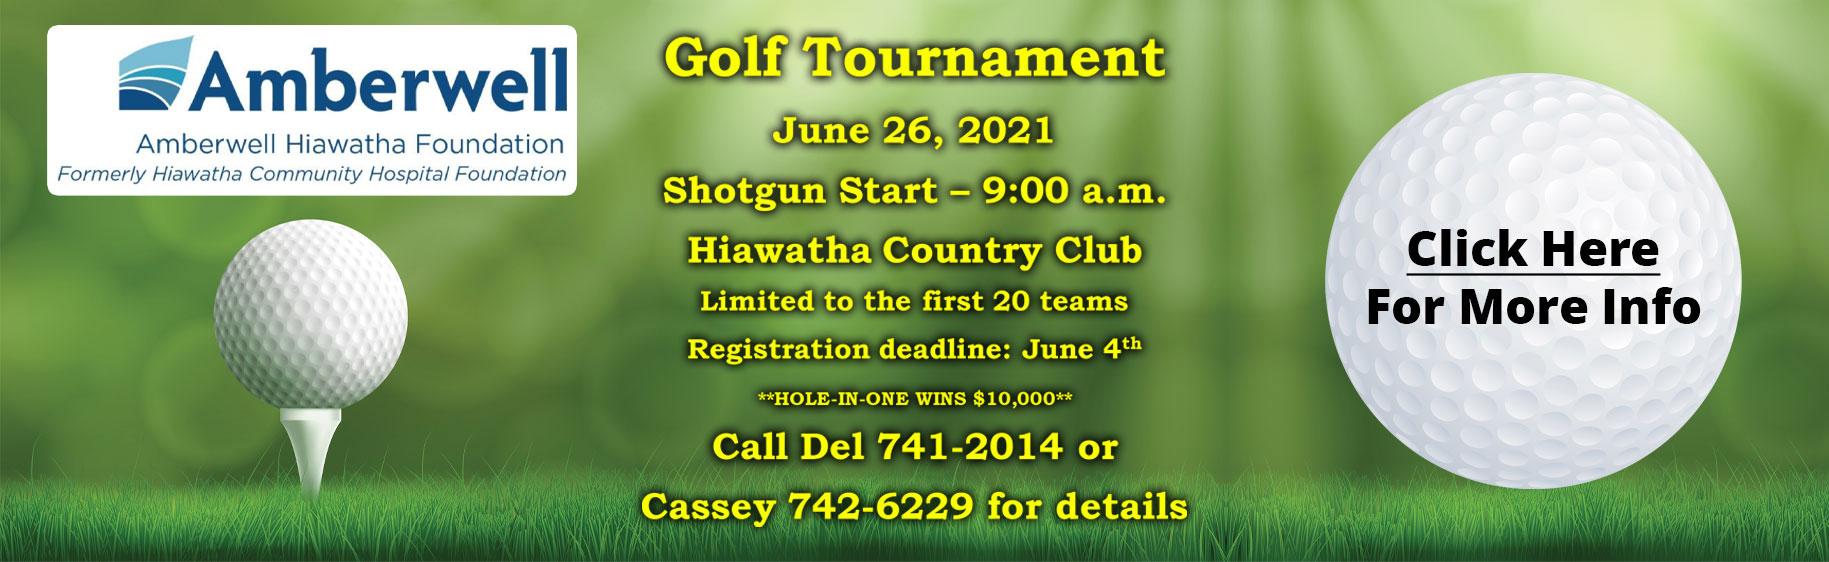 Golf Tournament  June 26th, 2021 Shotgun start - 9:00am Hiawatha Country Club Click for More Information